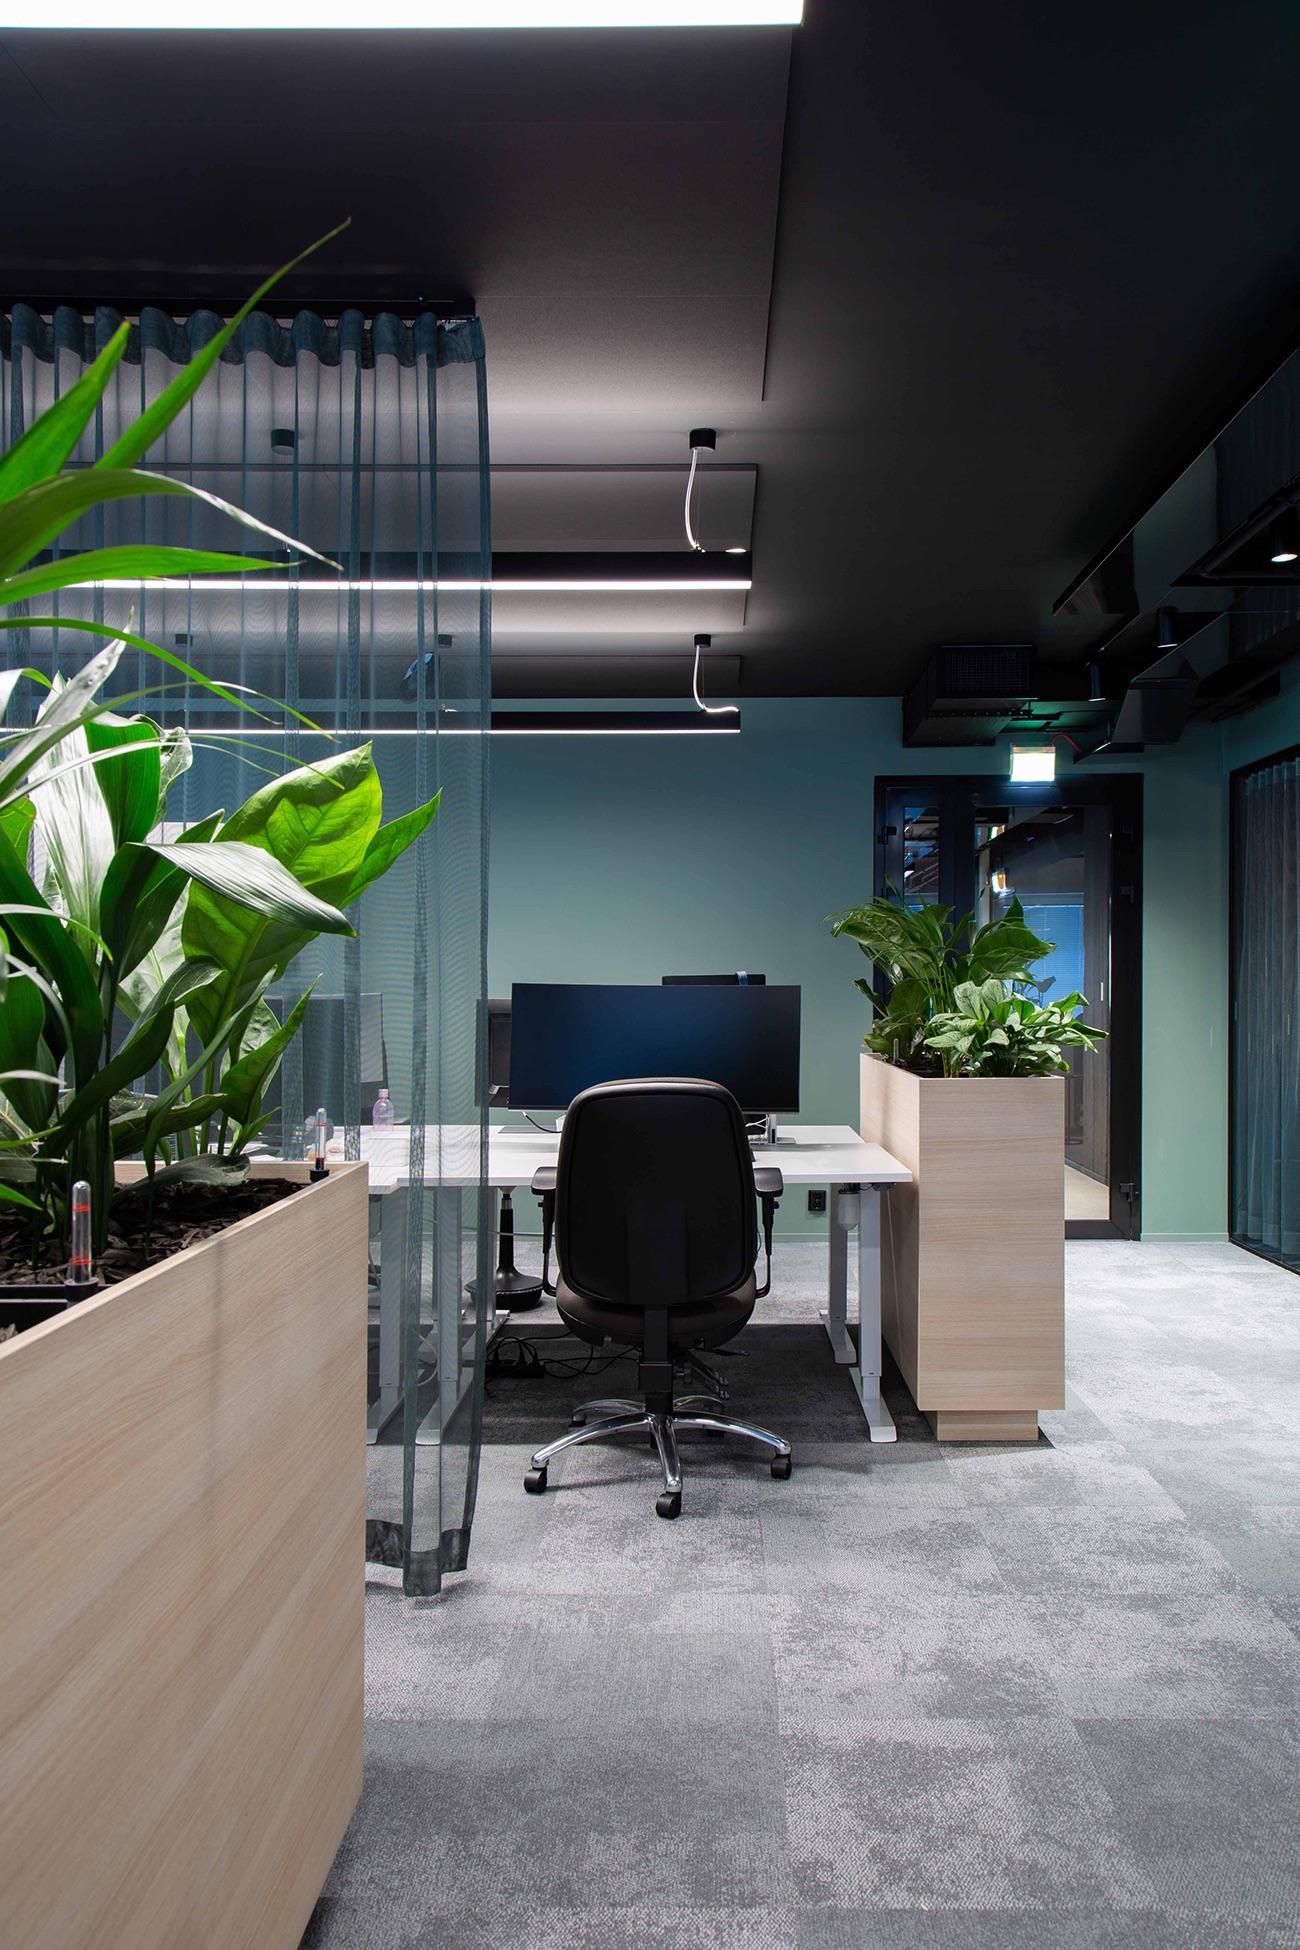 lamia-office-helsinki-12